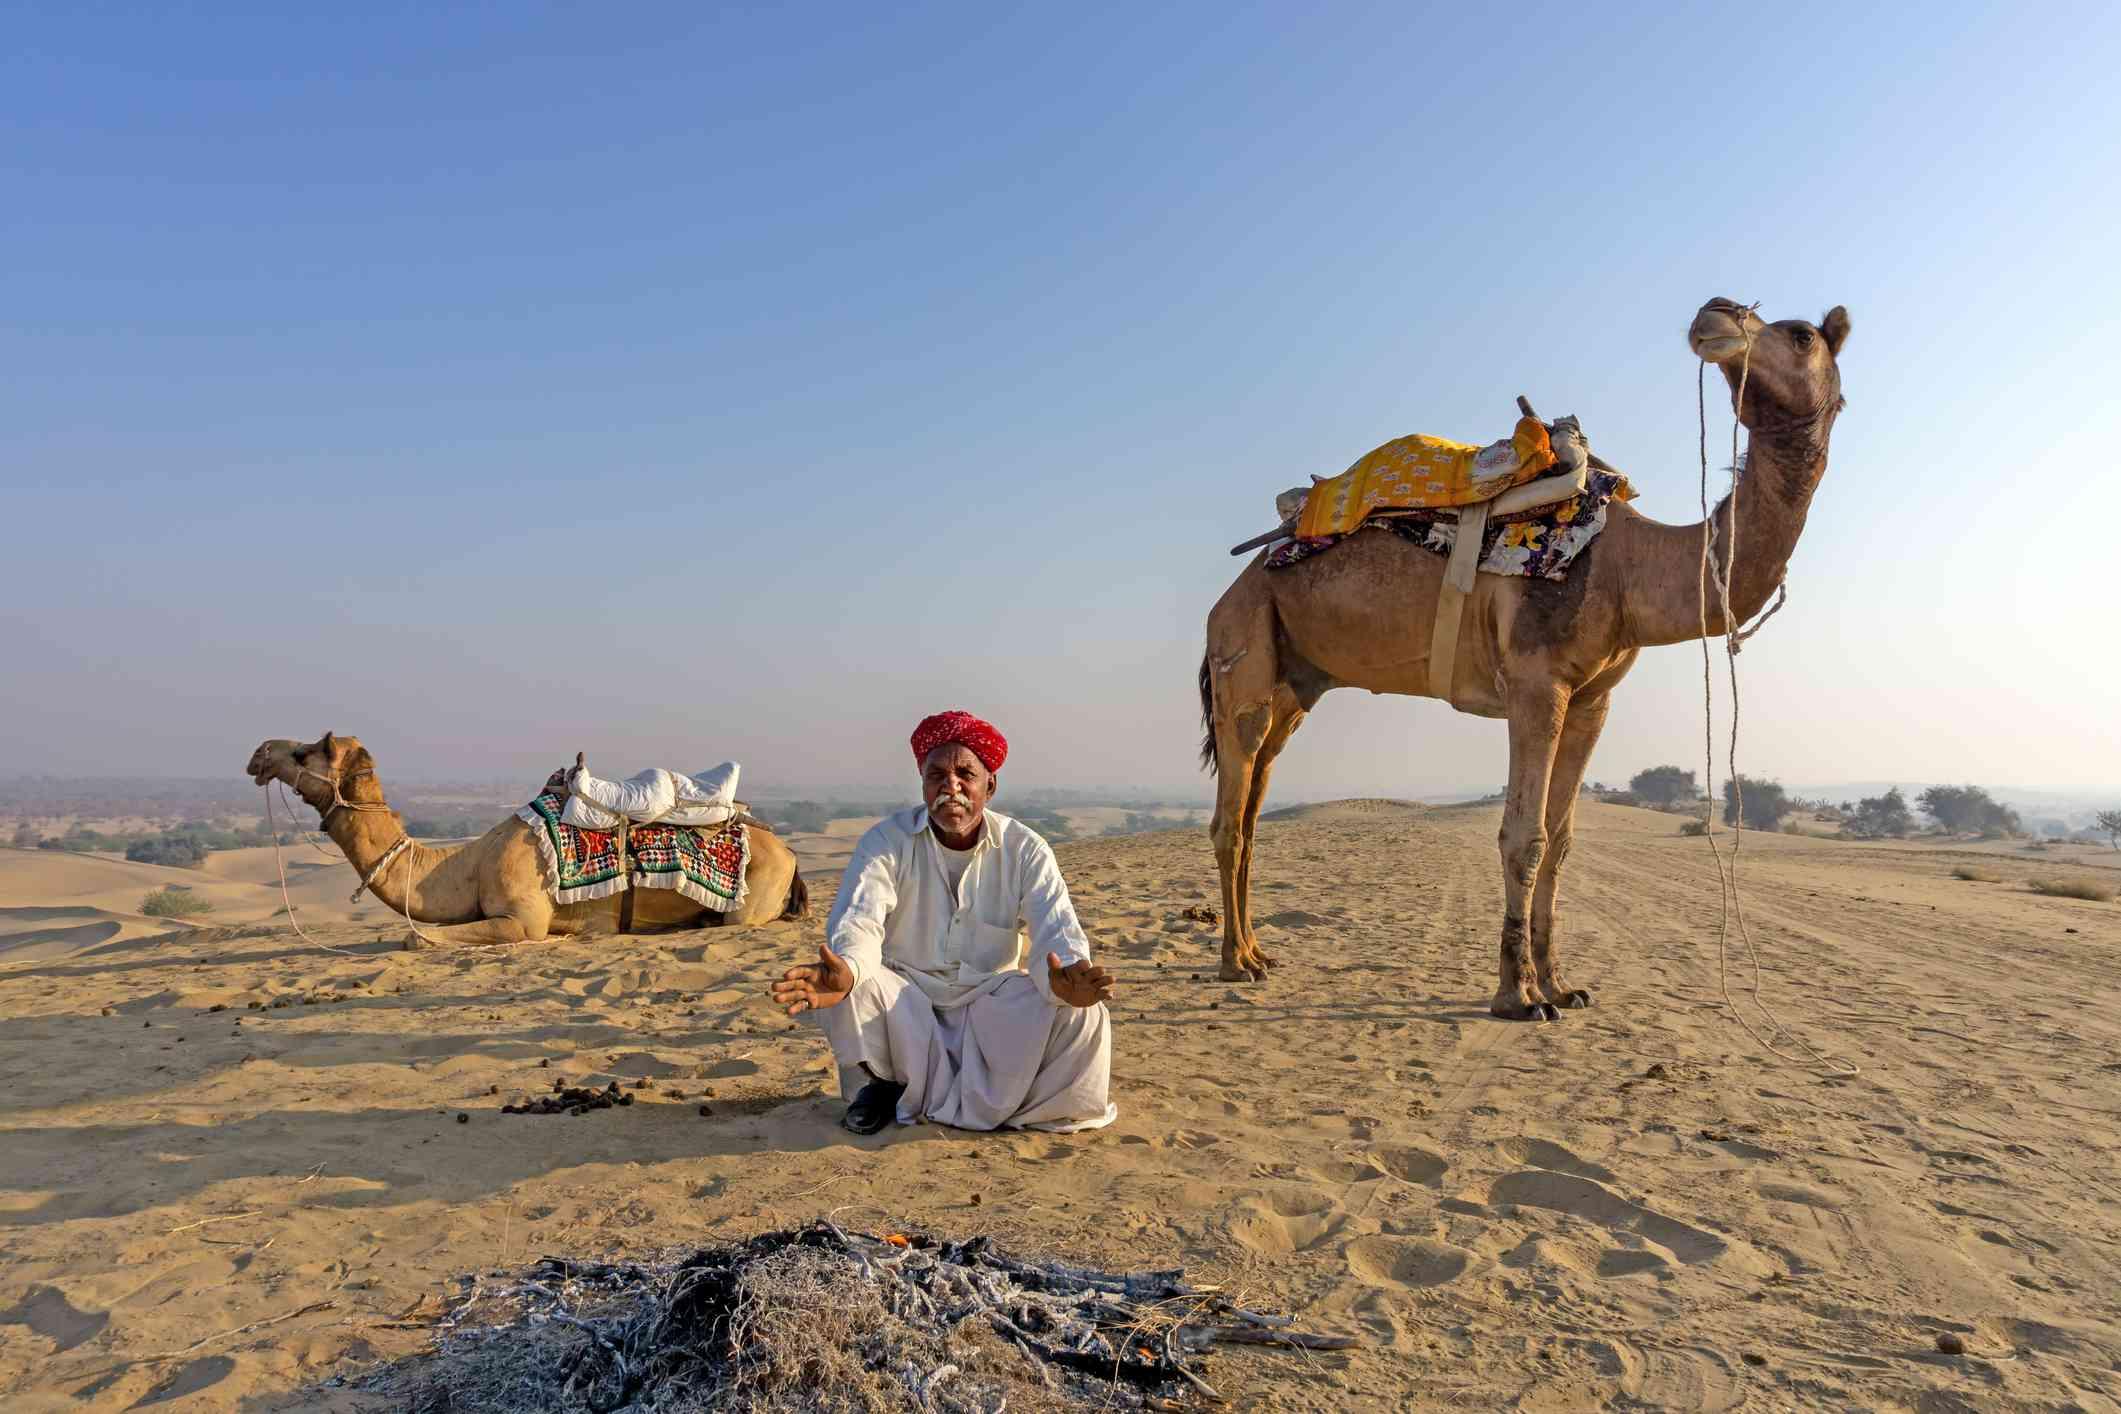 An Indian Man with Camel at Thar Desert